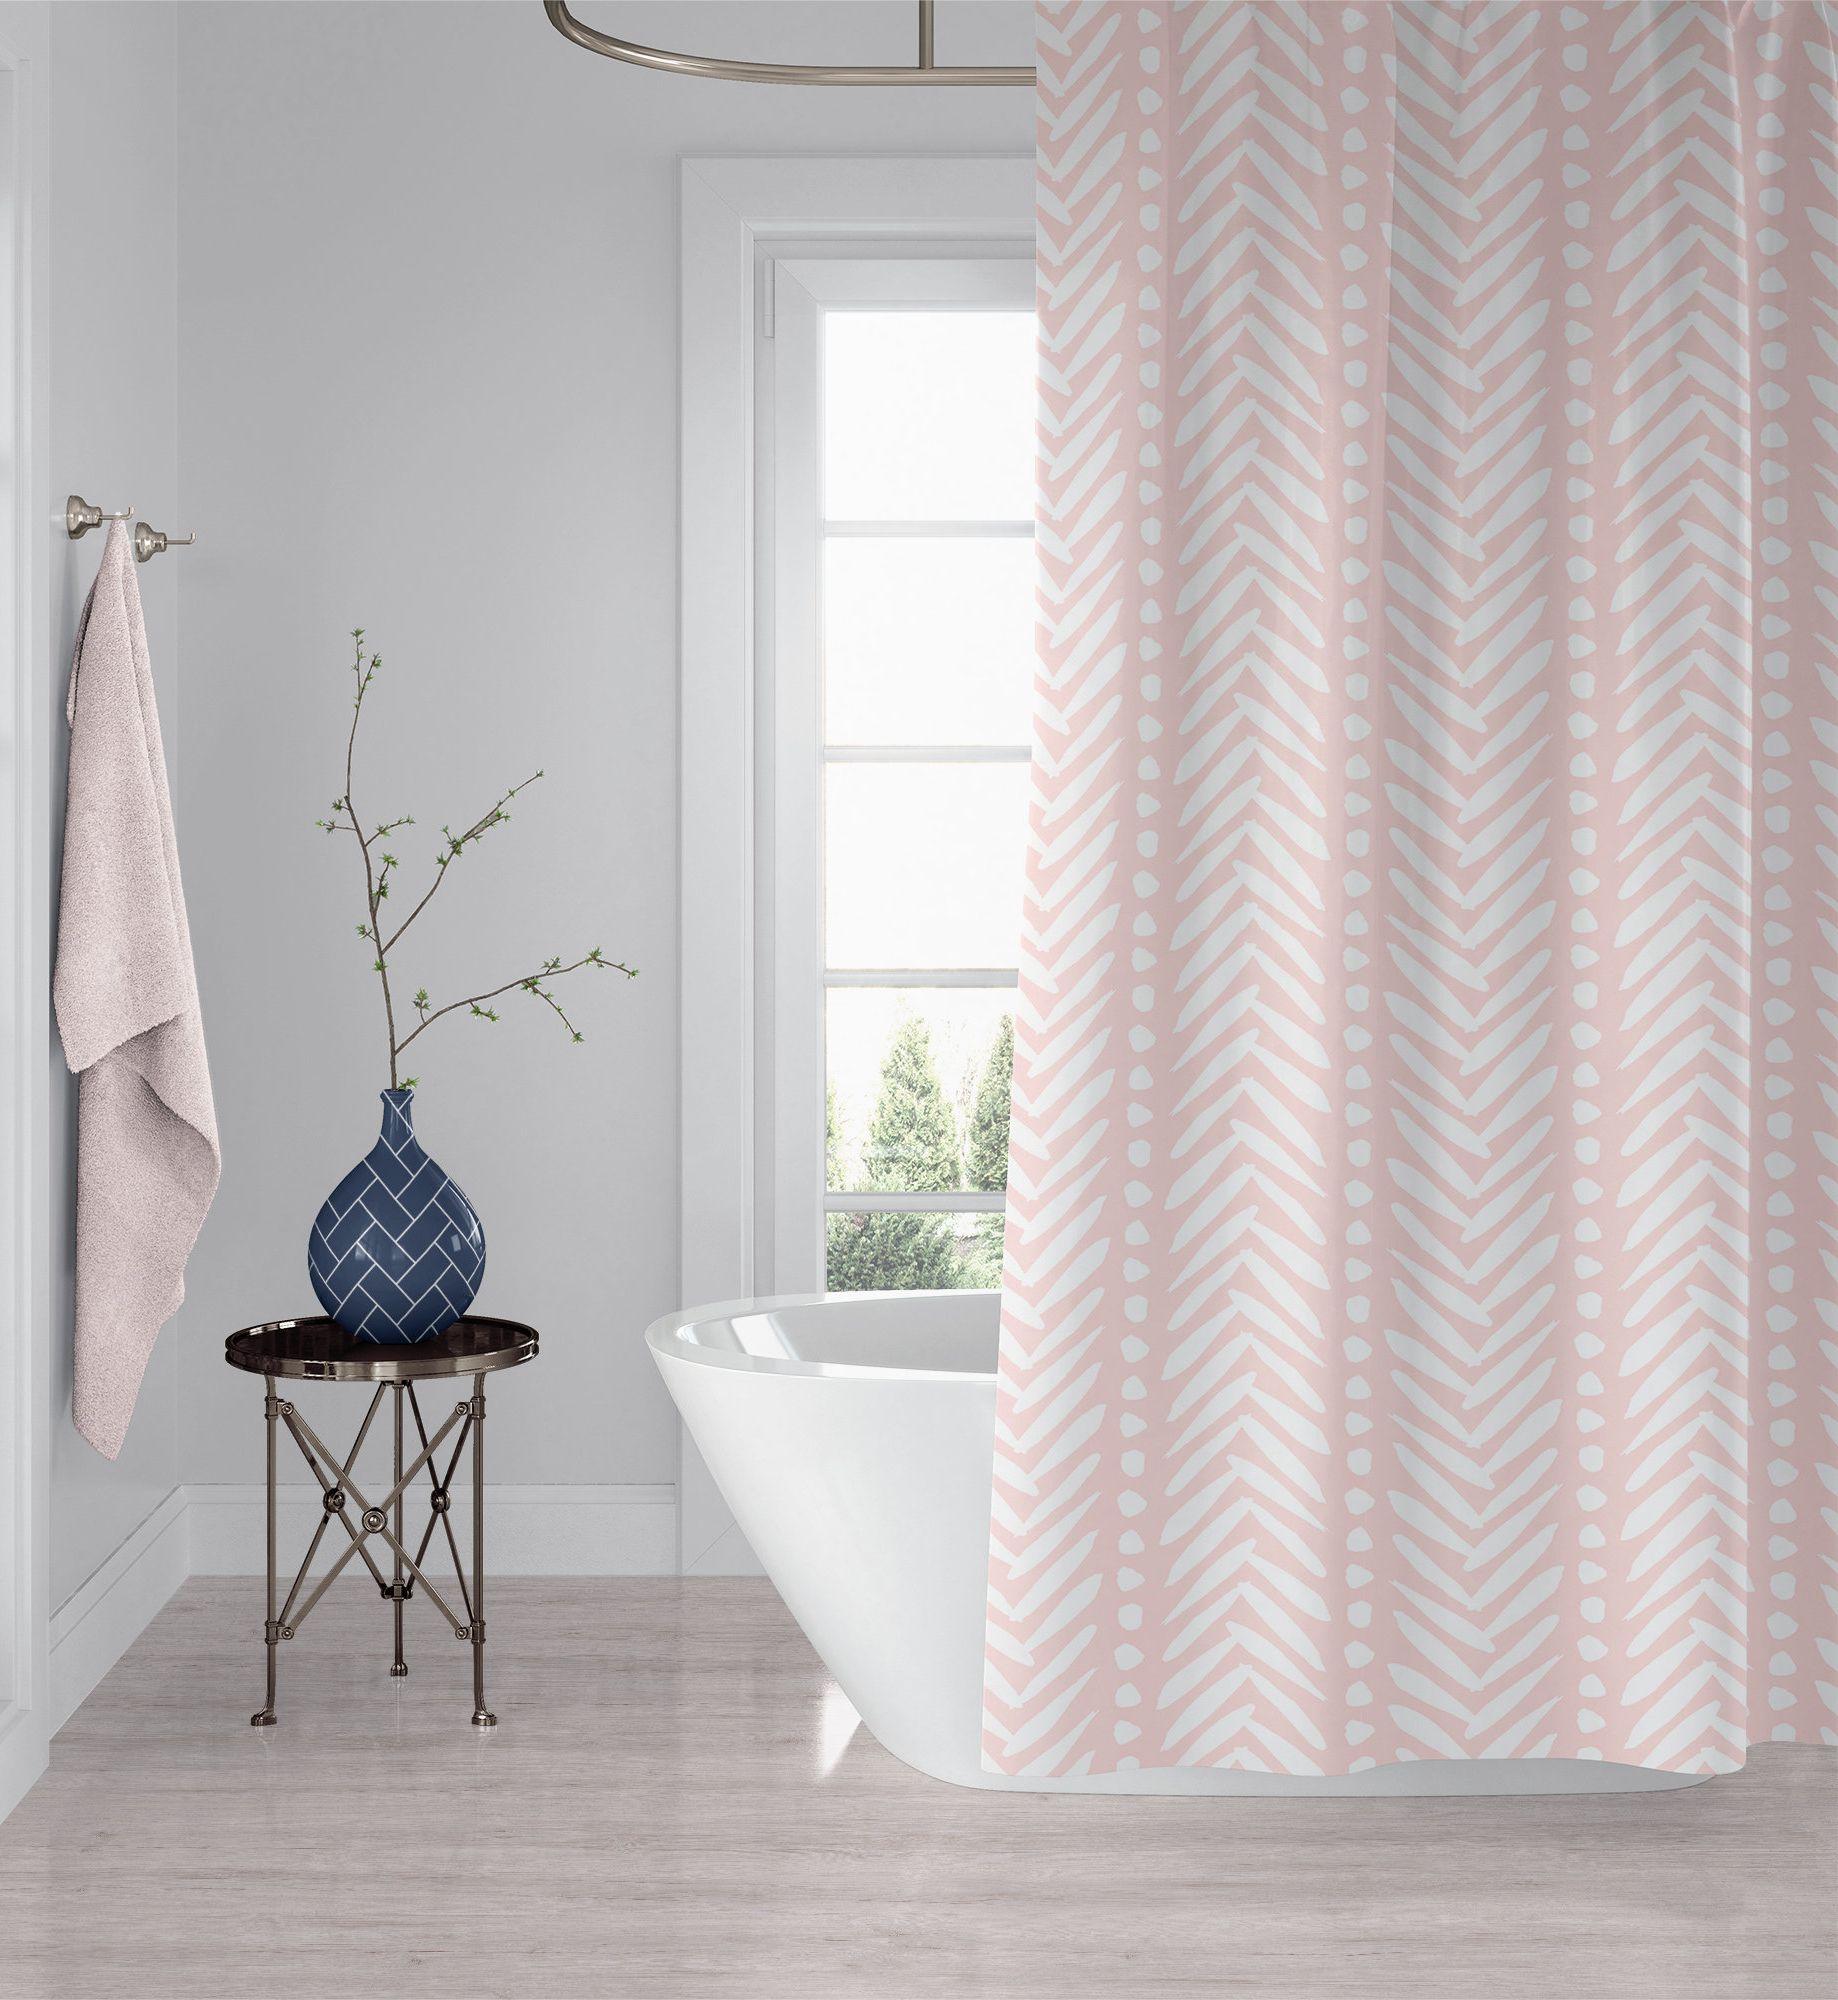 Light Rose Pink Herringbone Shower Curtain Blush Bohemian Fabric Bath Curtain Machine Washable 90x70 83x70 74x71 Custom Made Curtains Rose Lights Fabric Shower Curtains